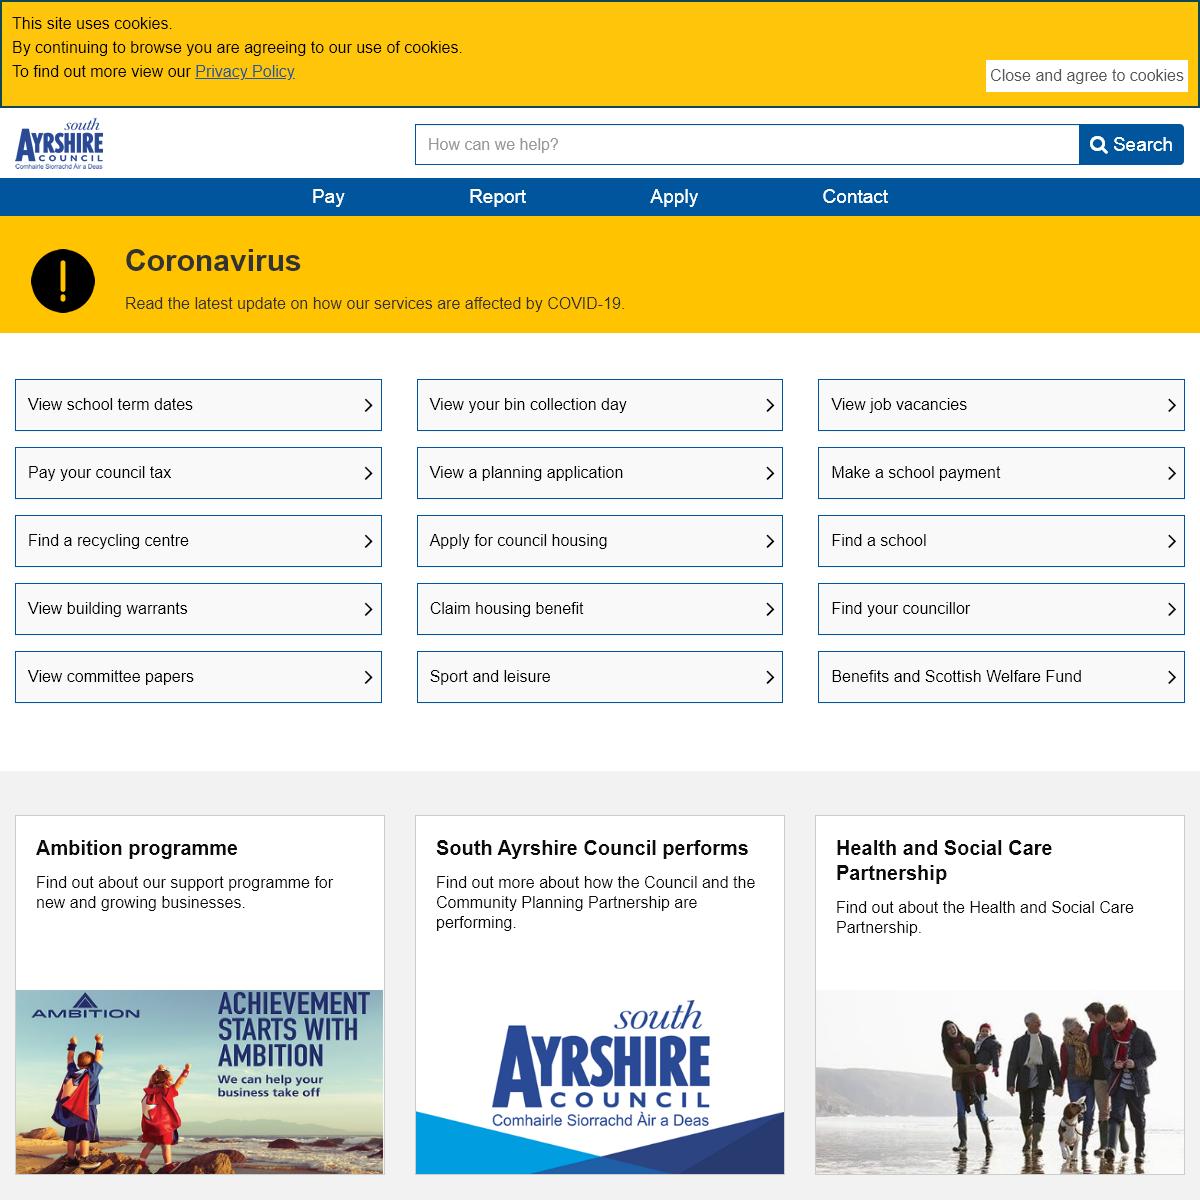 South Ayrshire Council